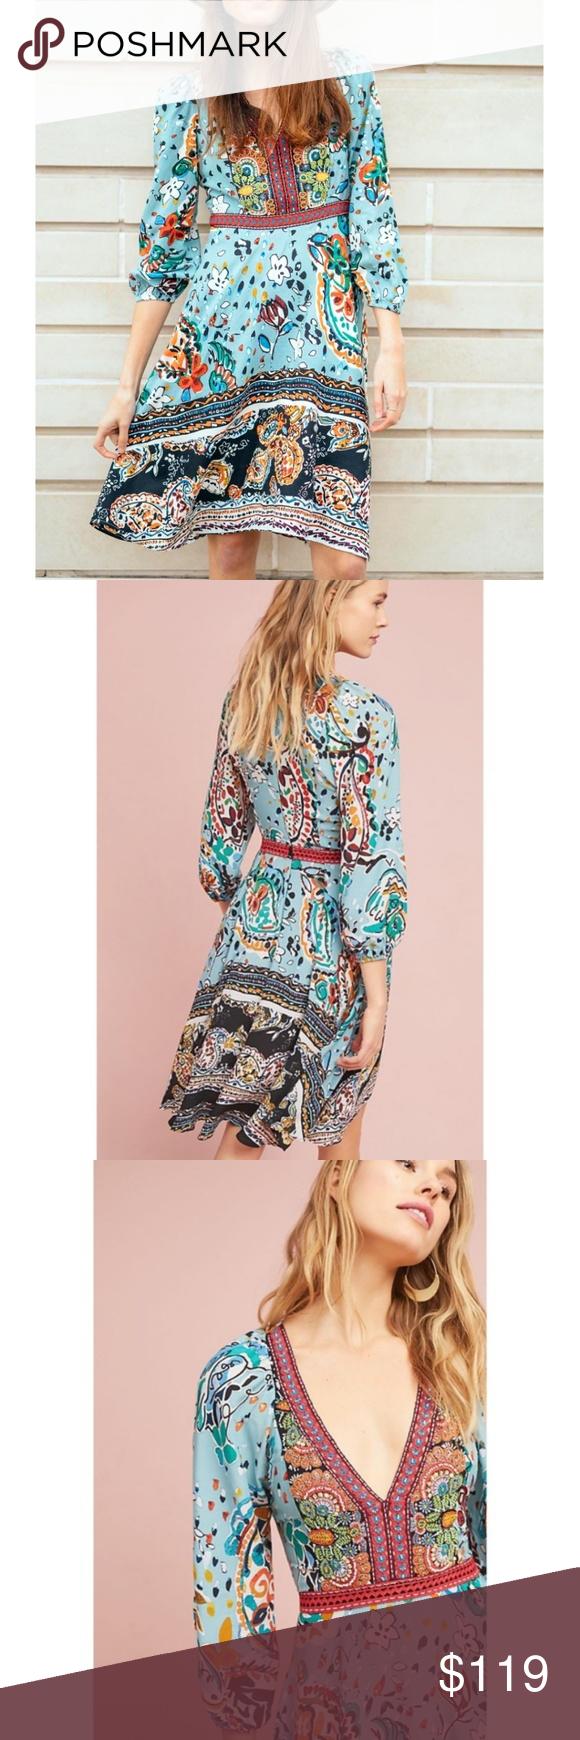 dcb6e99f5aff1 NWT ANTHROPOLOGIE Beaded Embellished Karmina Dress Brand new with tags NWT  ANTHROPOLOGIE Akemi + Kin Beaded